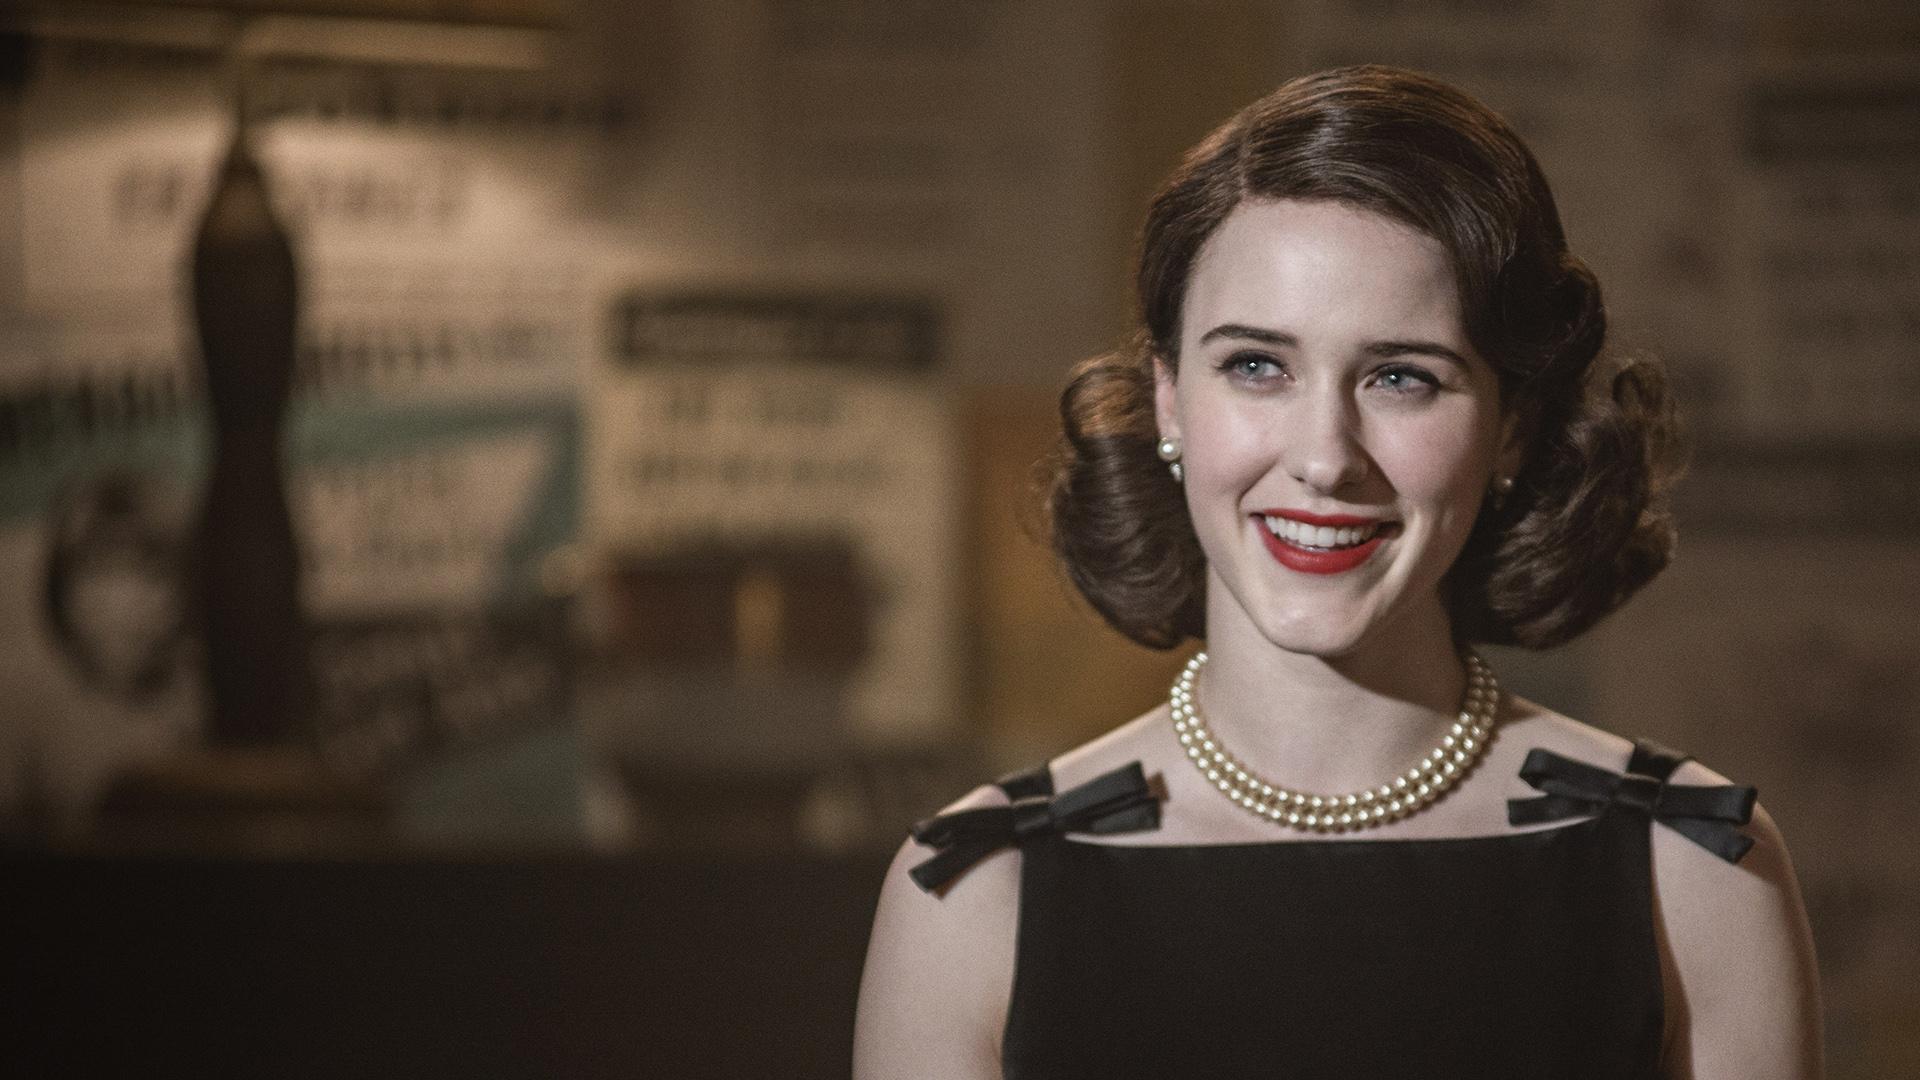 Watch The Marvelous Mrs. Maisel - Season 3 on Amazon Prime Video UK